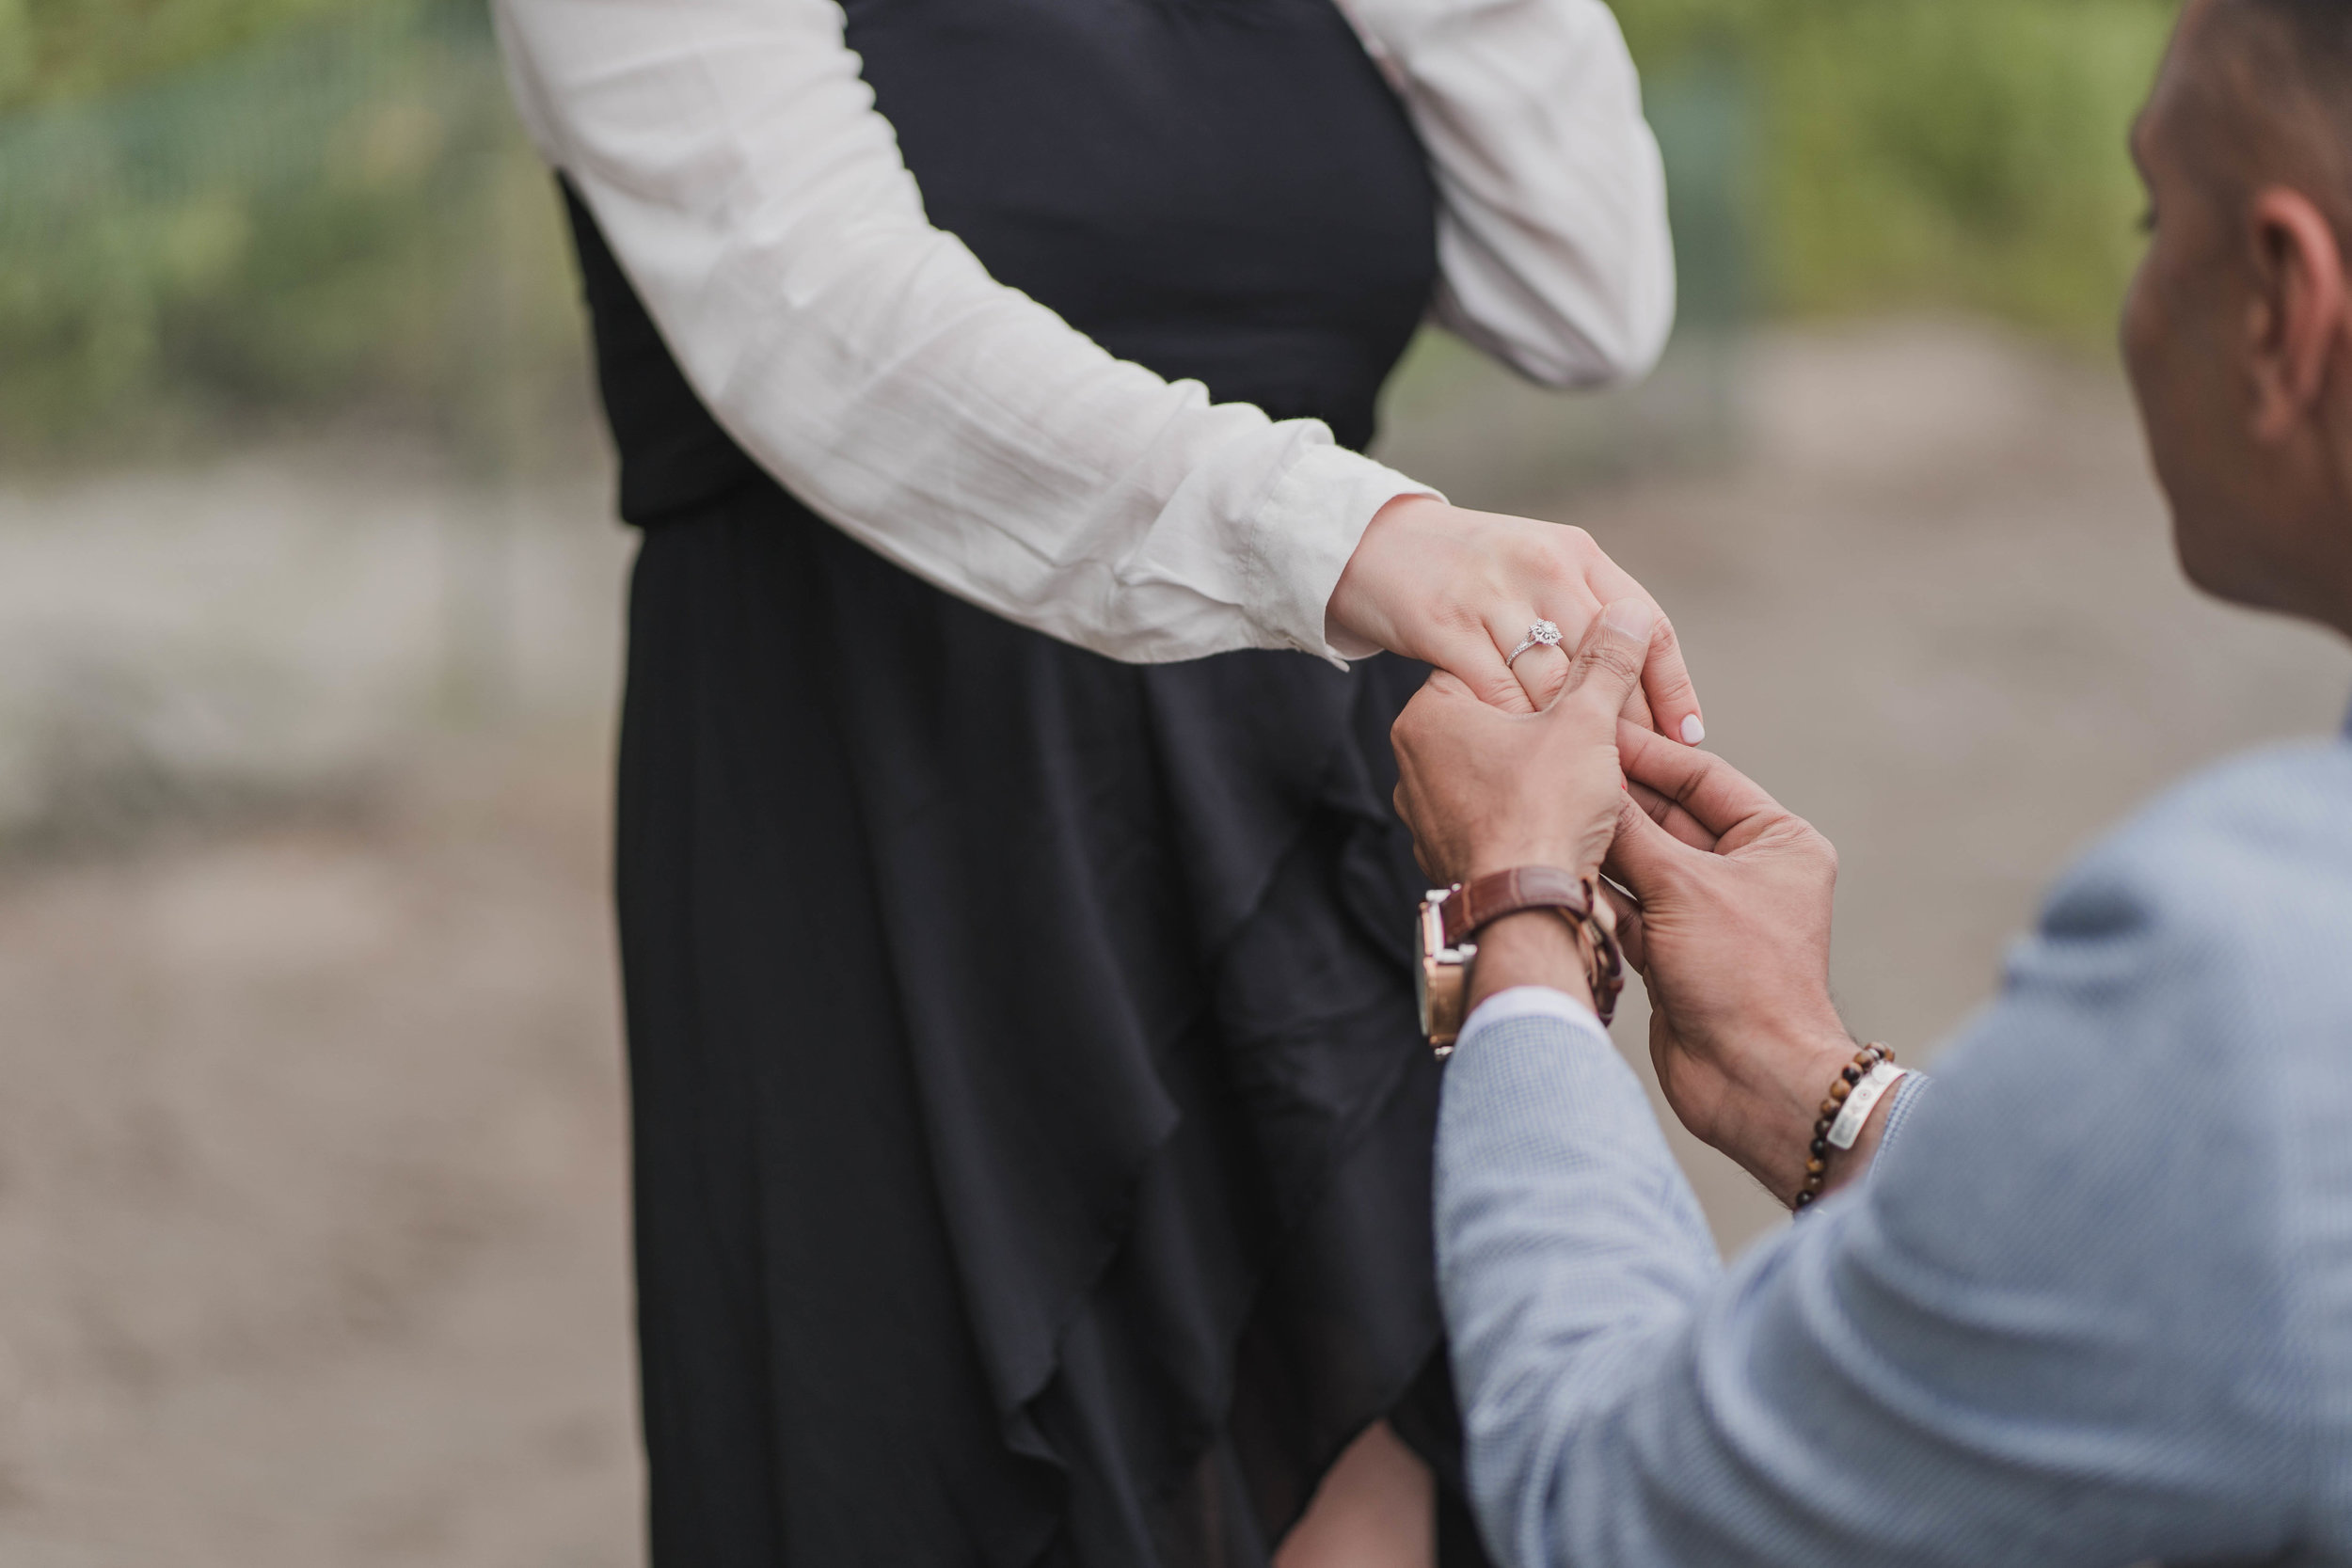 20190622 - Monika & Johnson Engagement - 0141.jpg